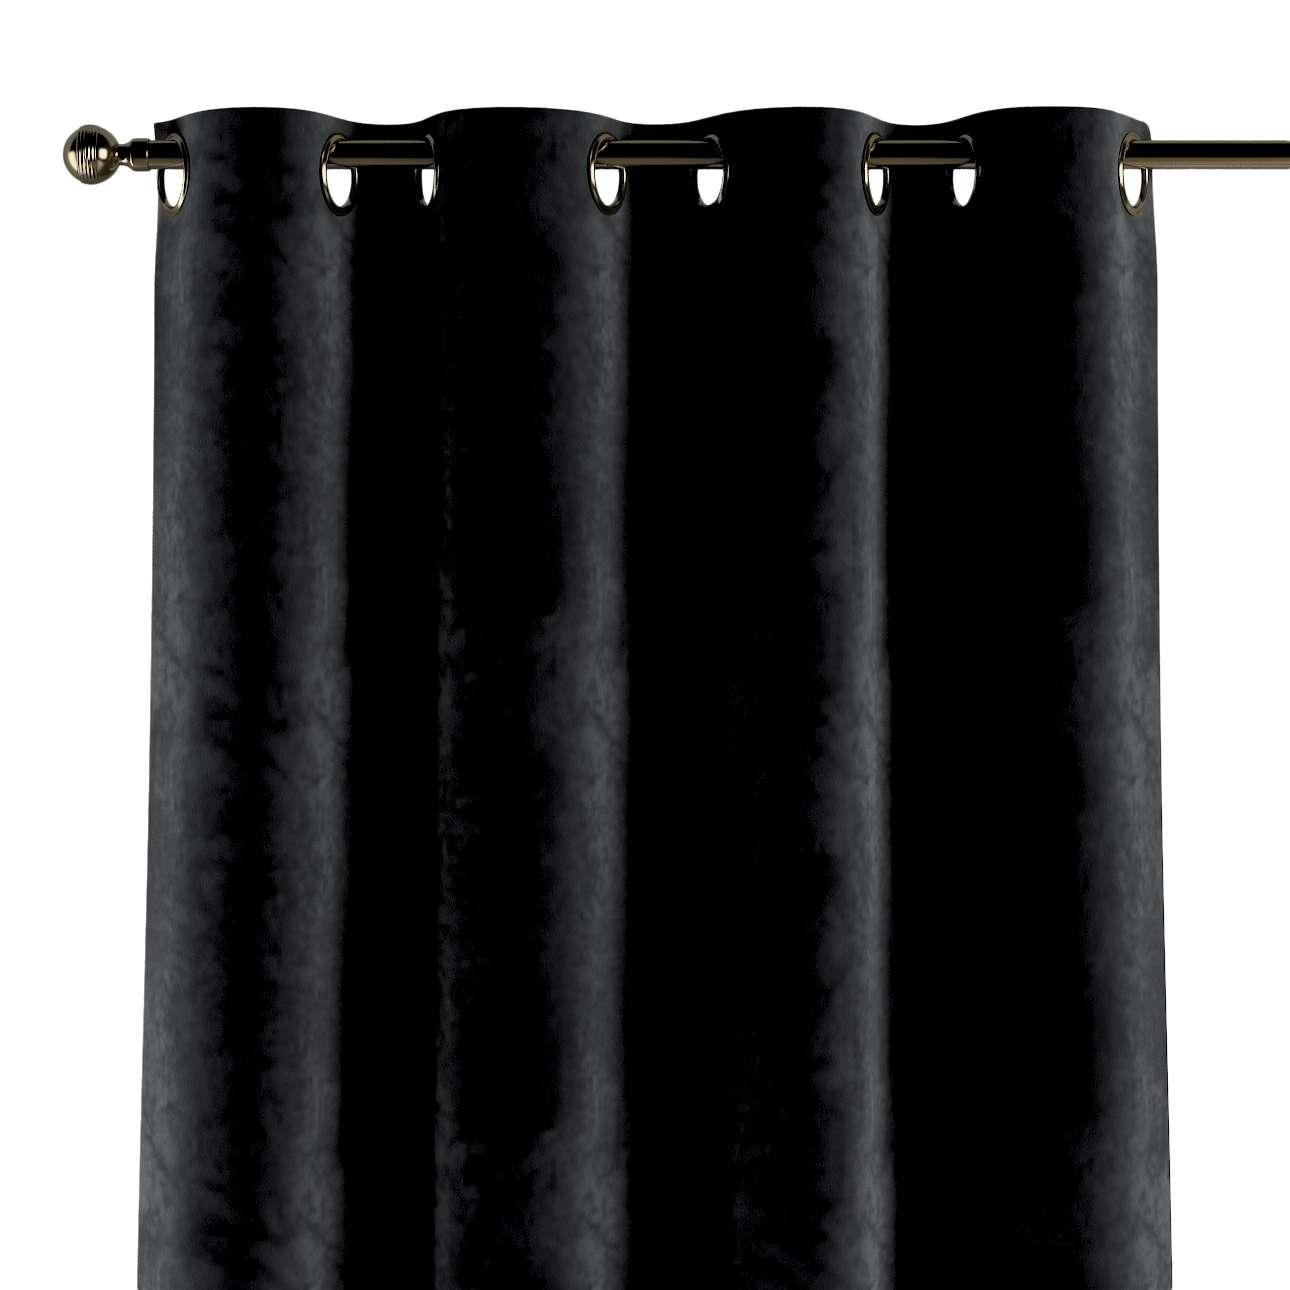 Zasłona na kółkach 1 szt. w kolekcji Velvet, tkanina: 704-17